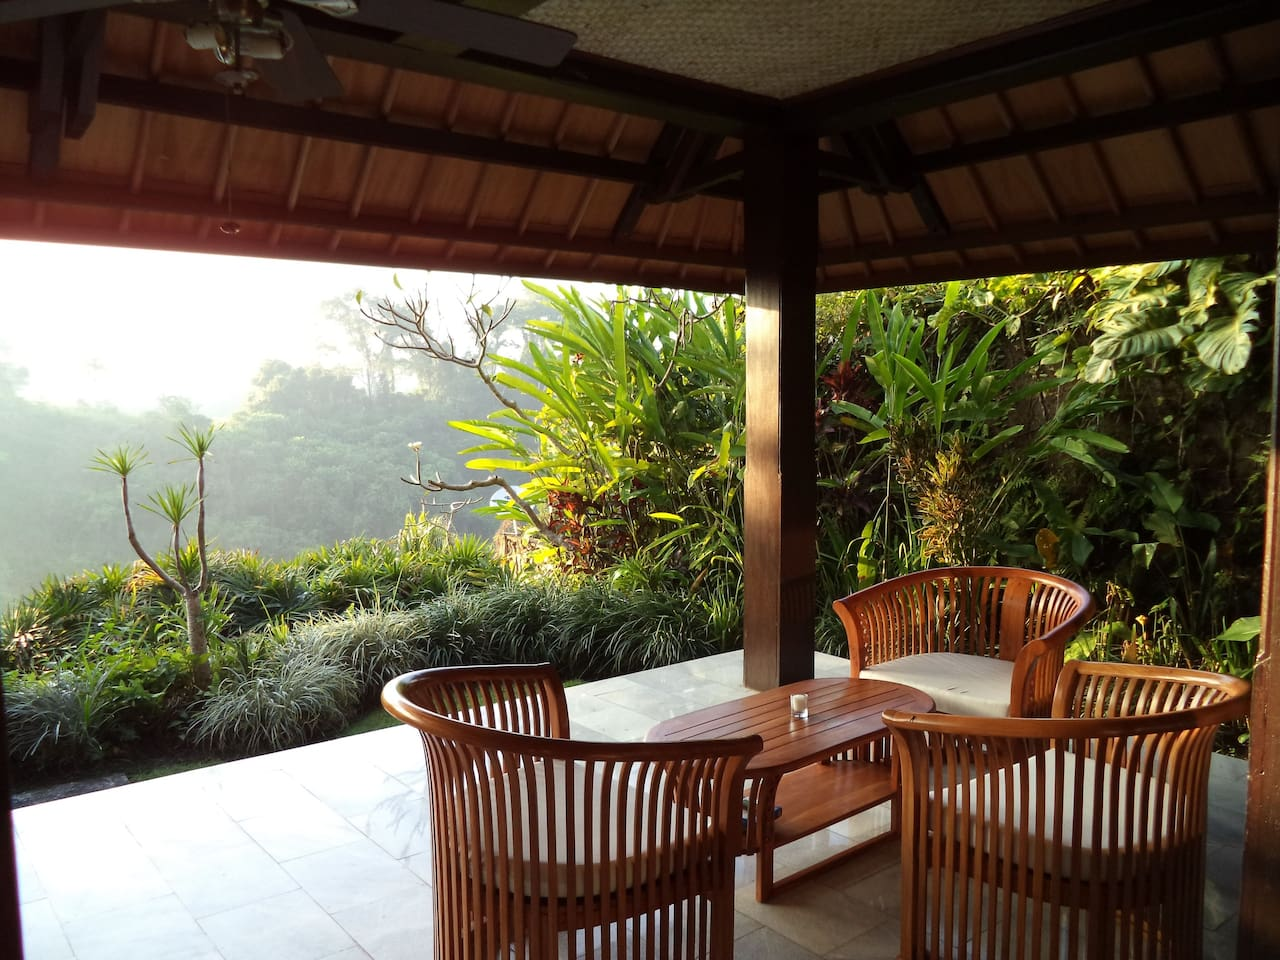 Private verandah and small garden, worlds away